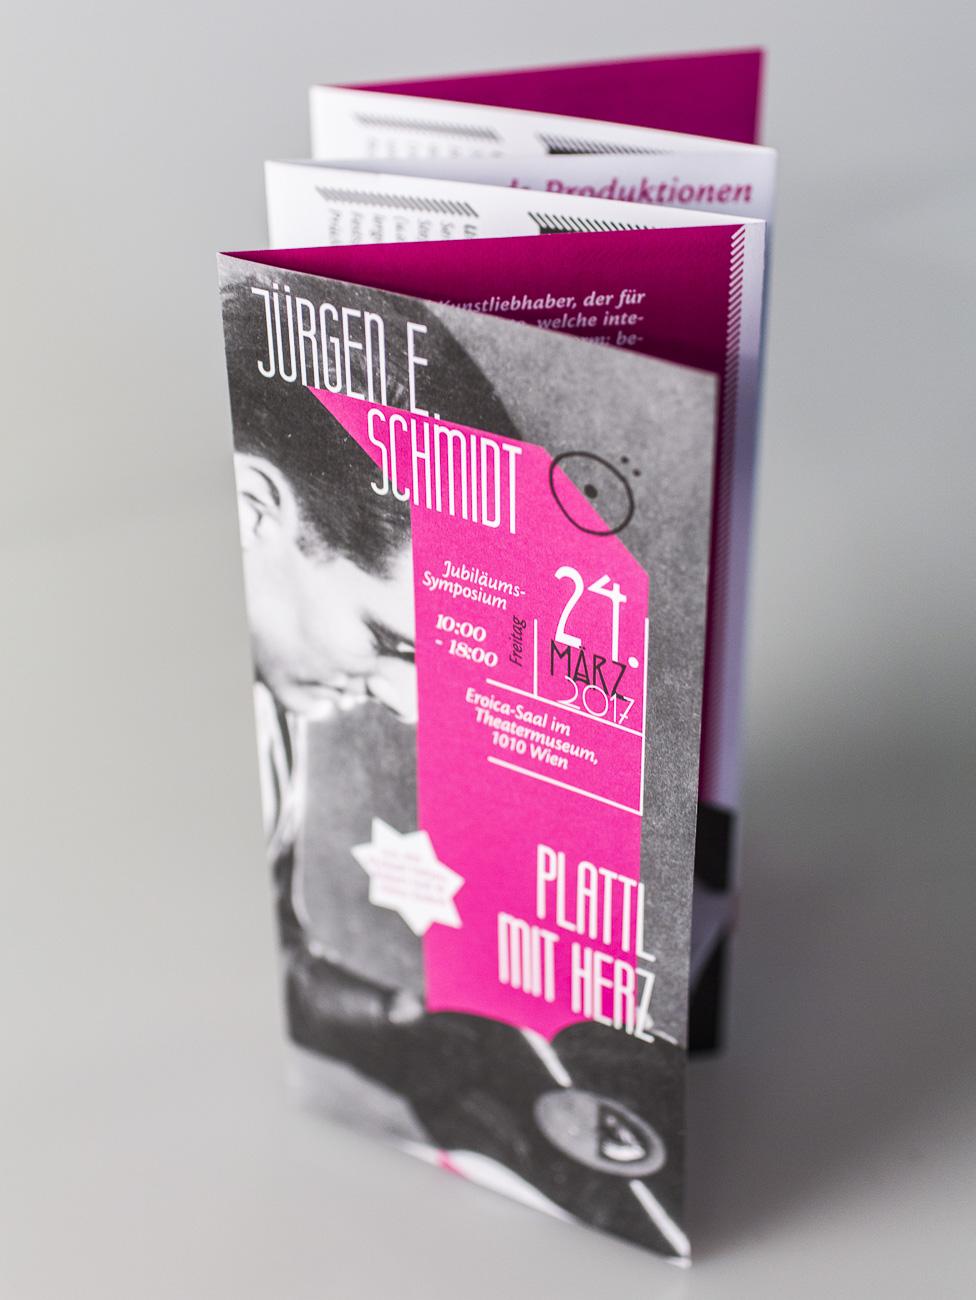 PlattlMitHerz-KatalogMockup-1.jpg